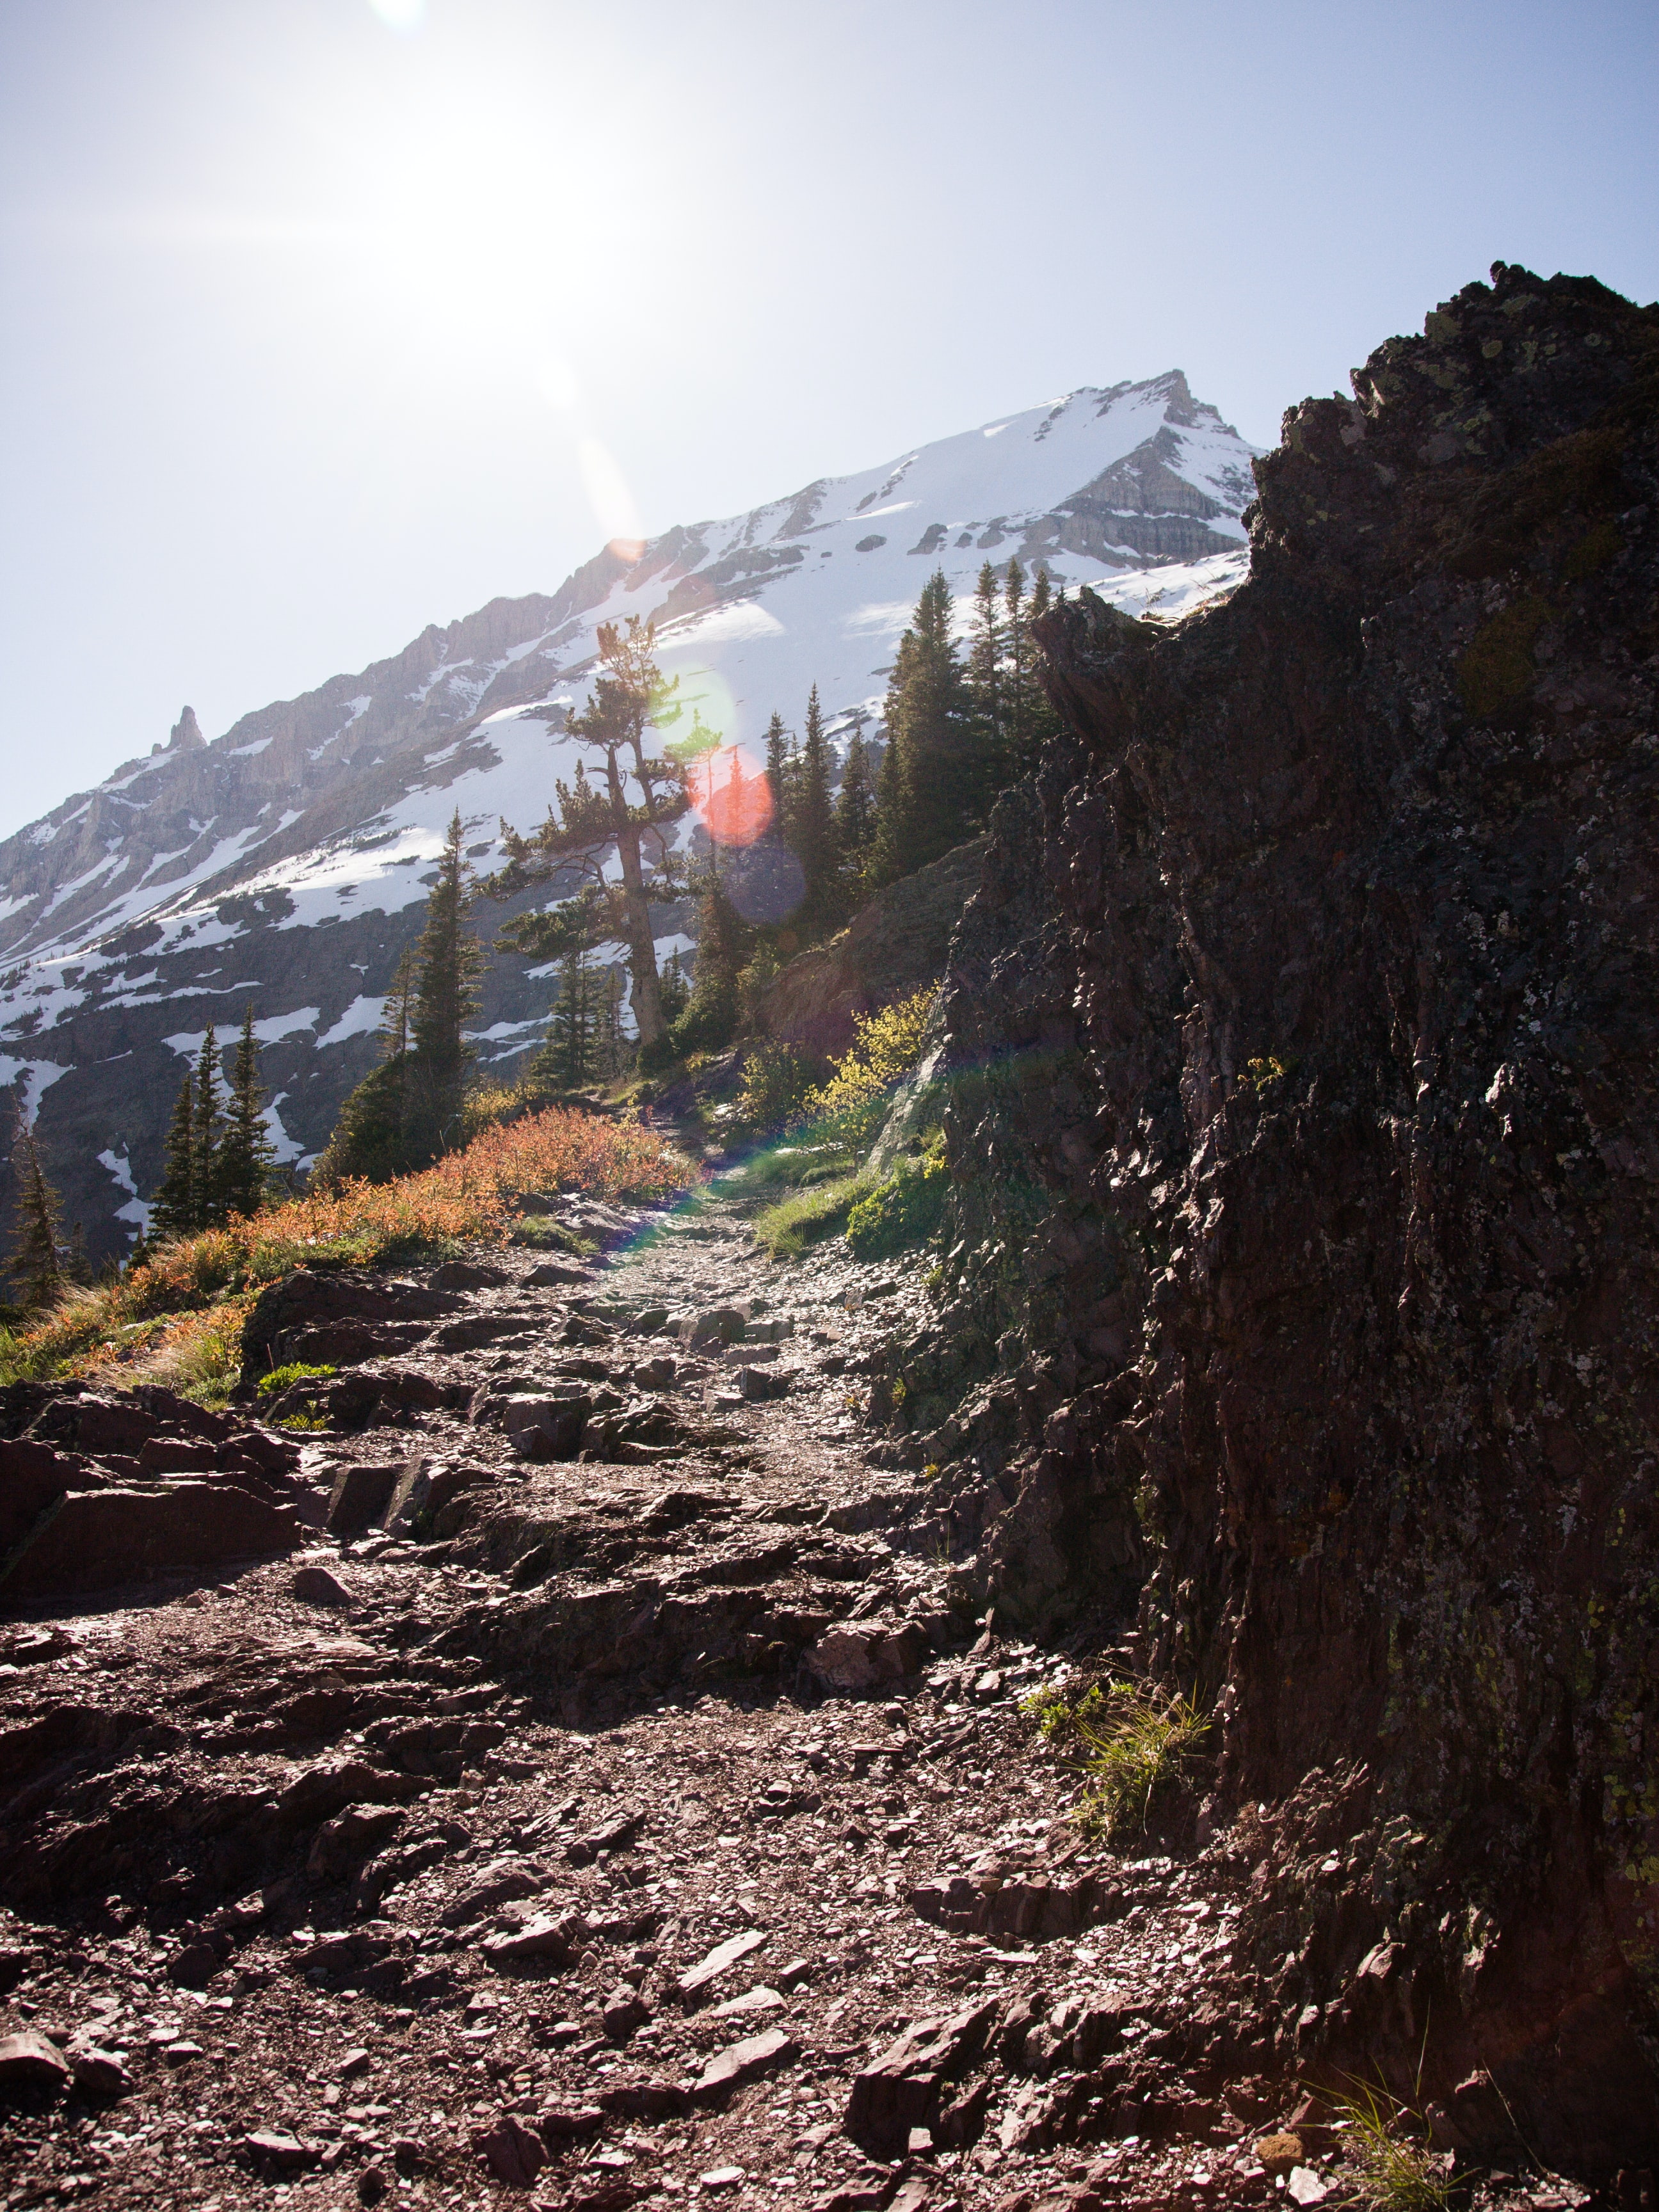 rock mountain trail towards alps